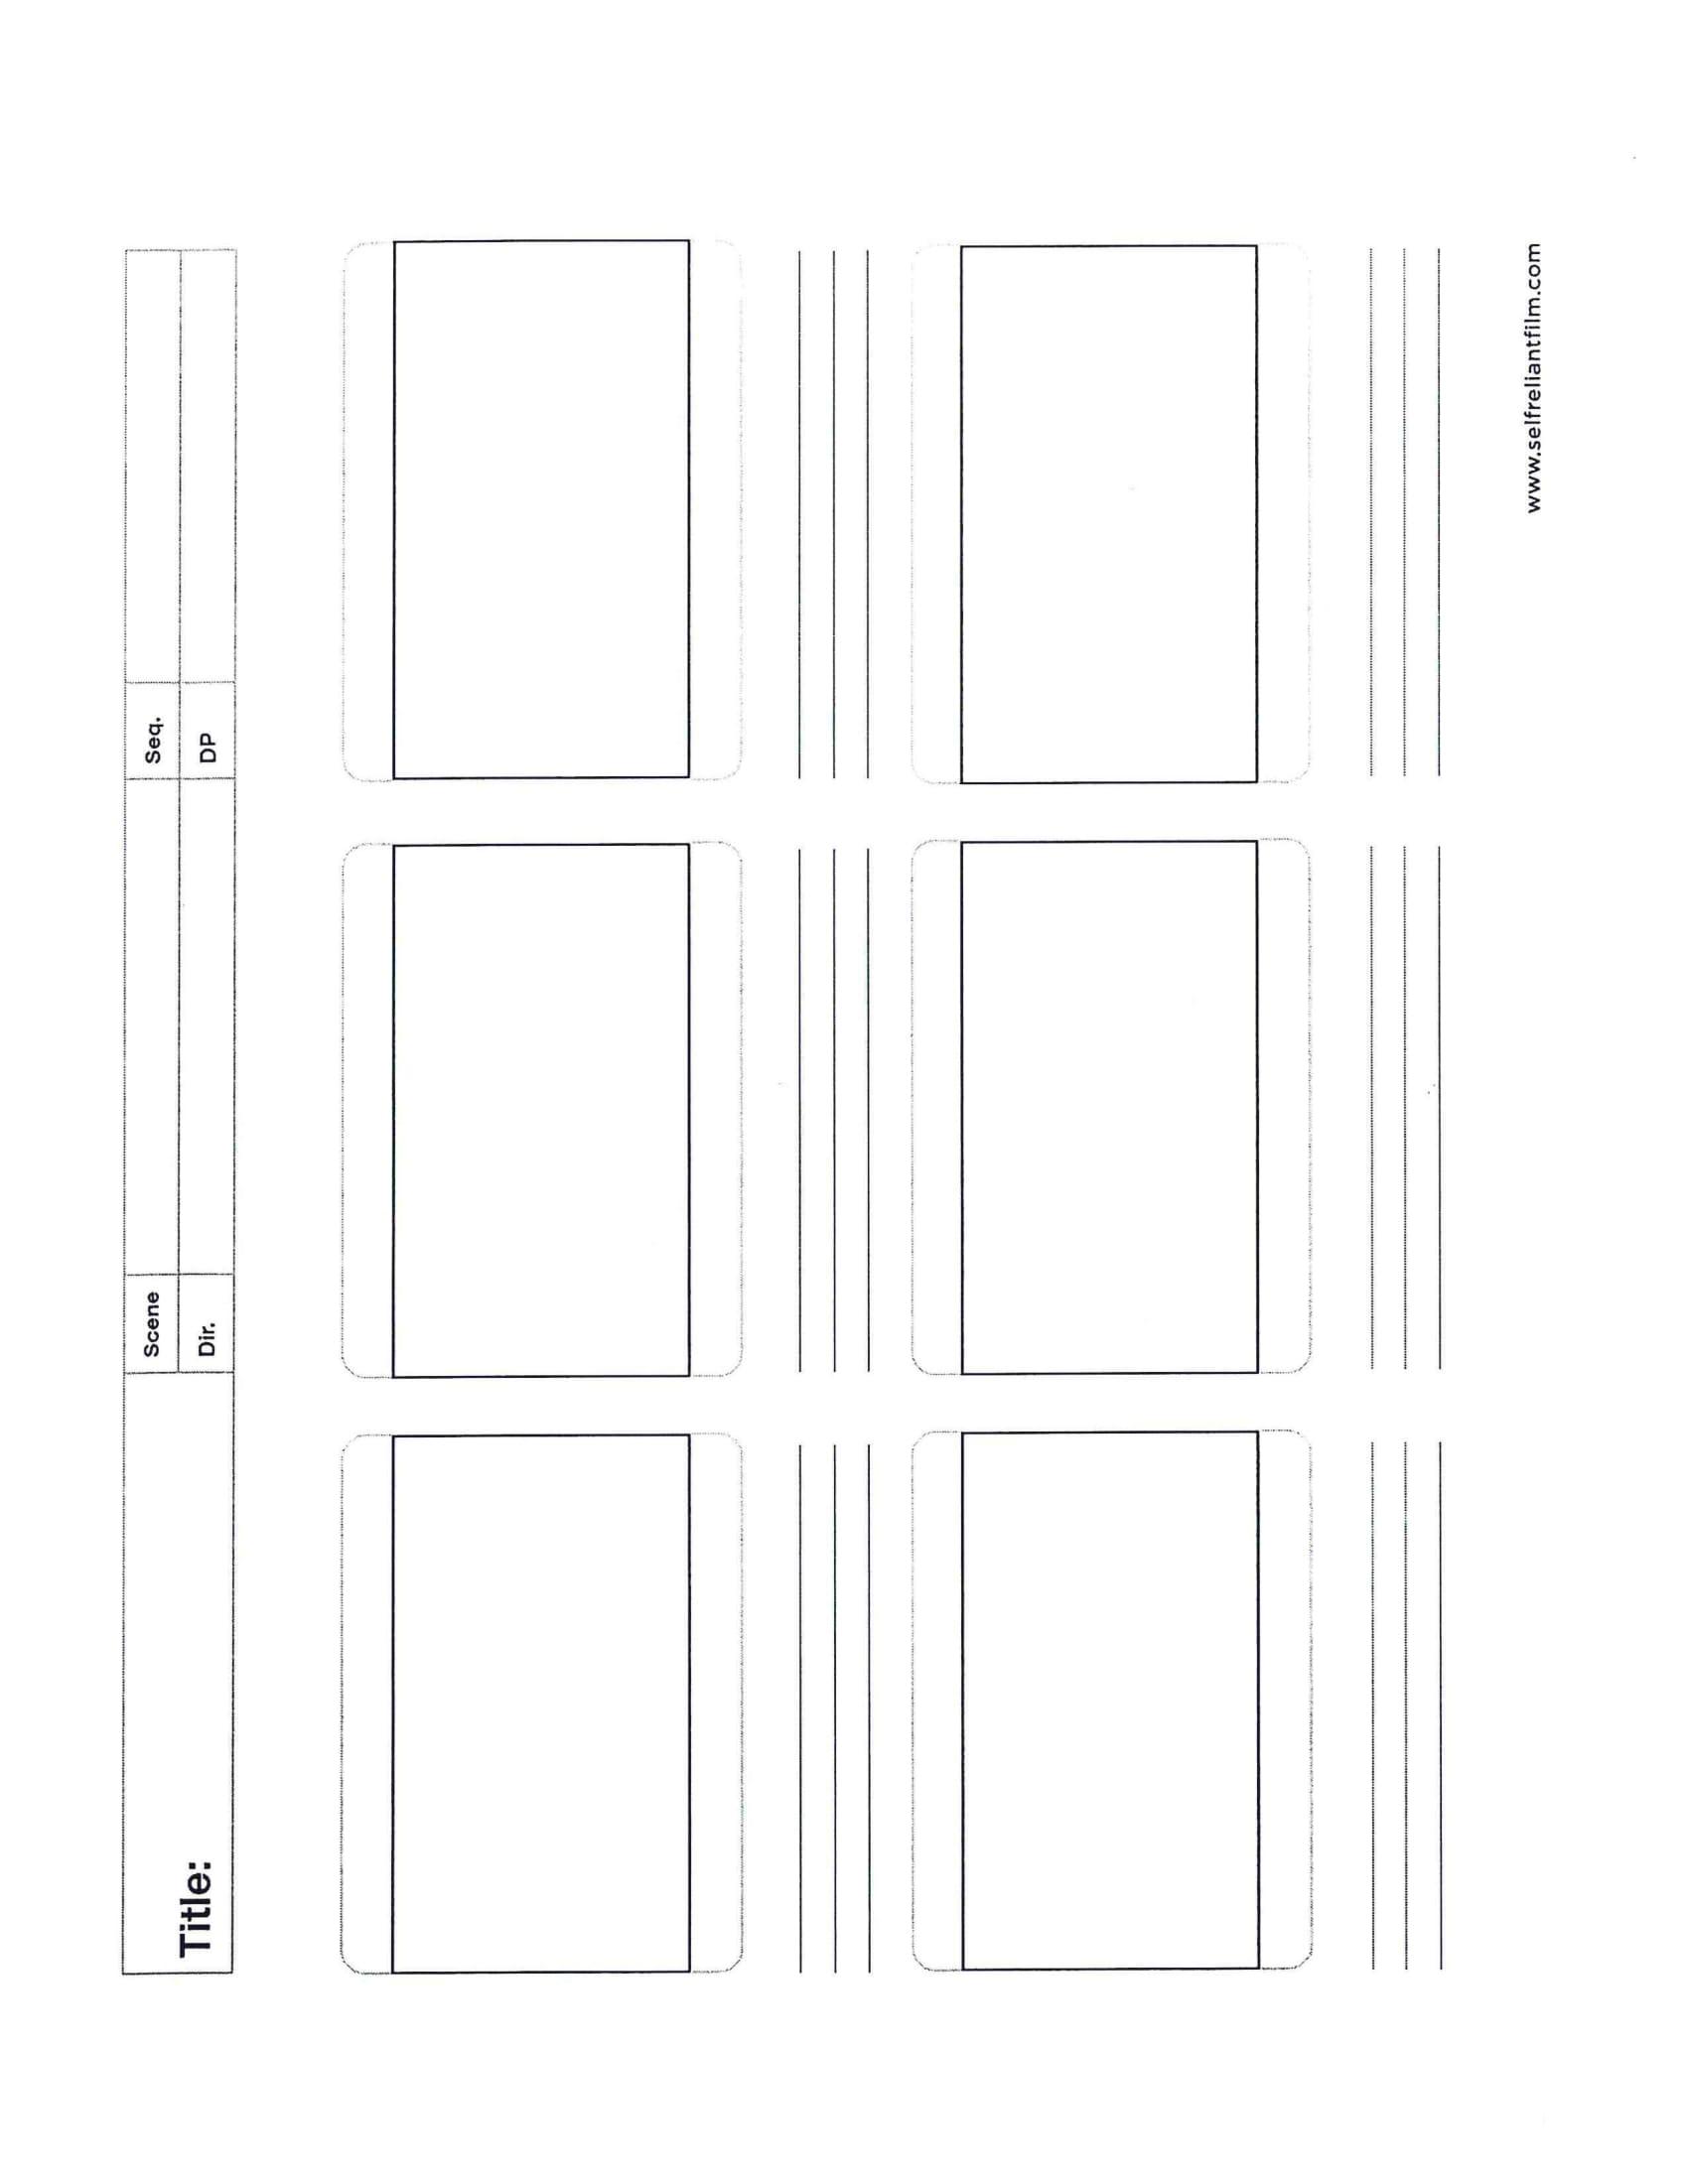 Production Worksheets-04.jpg